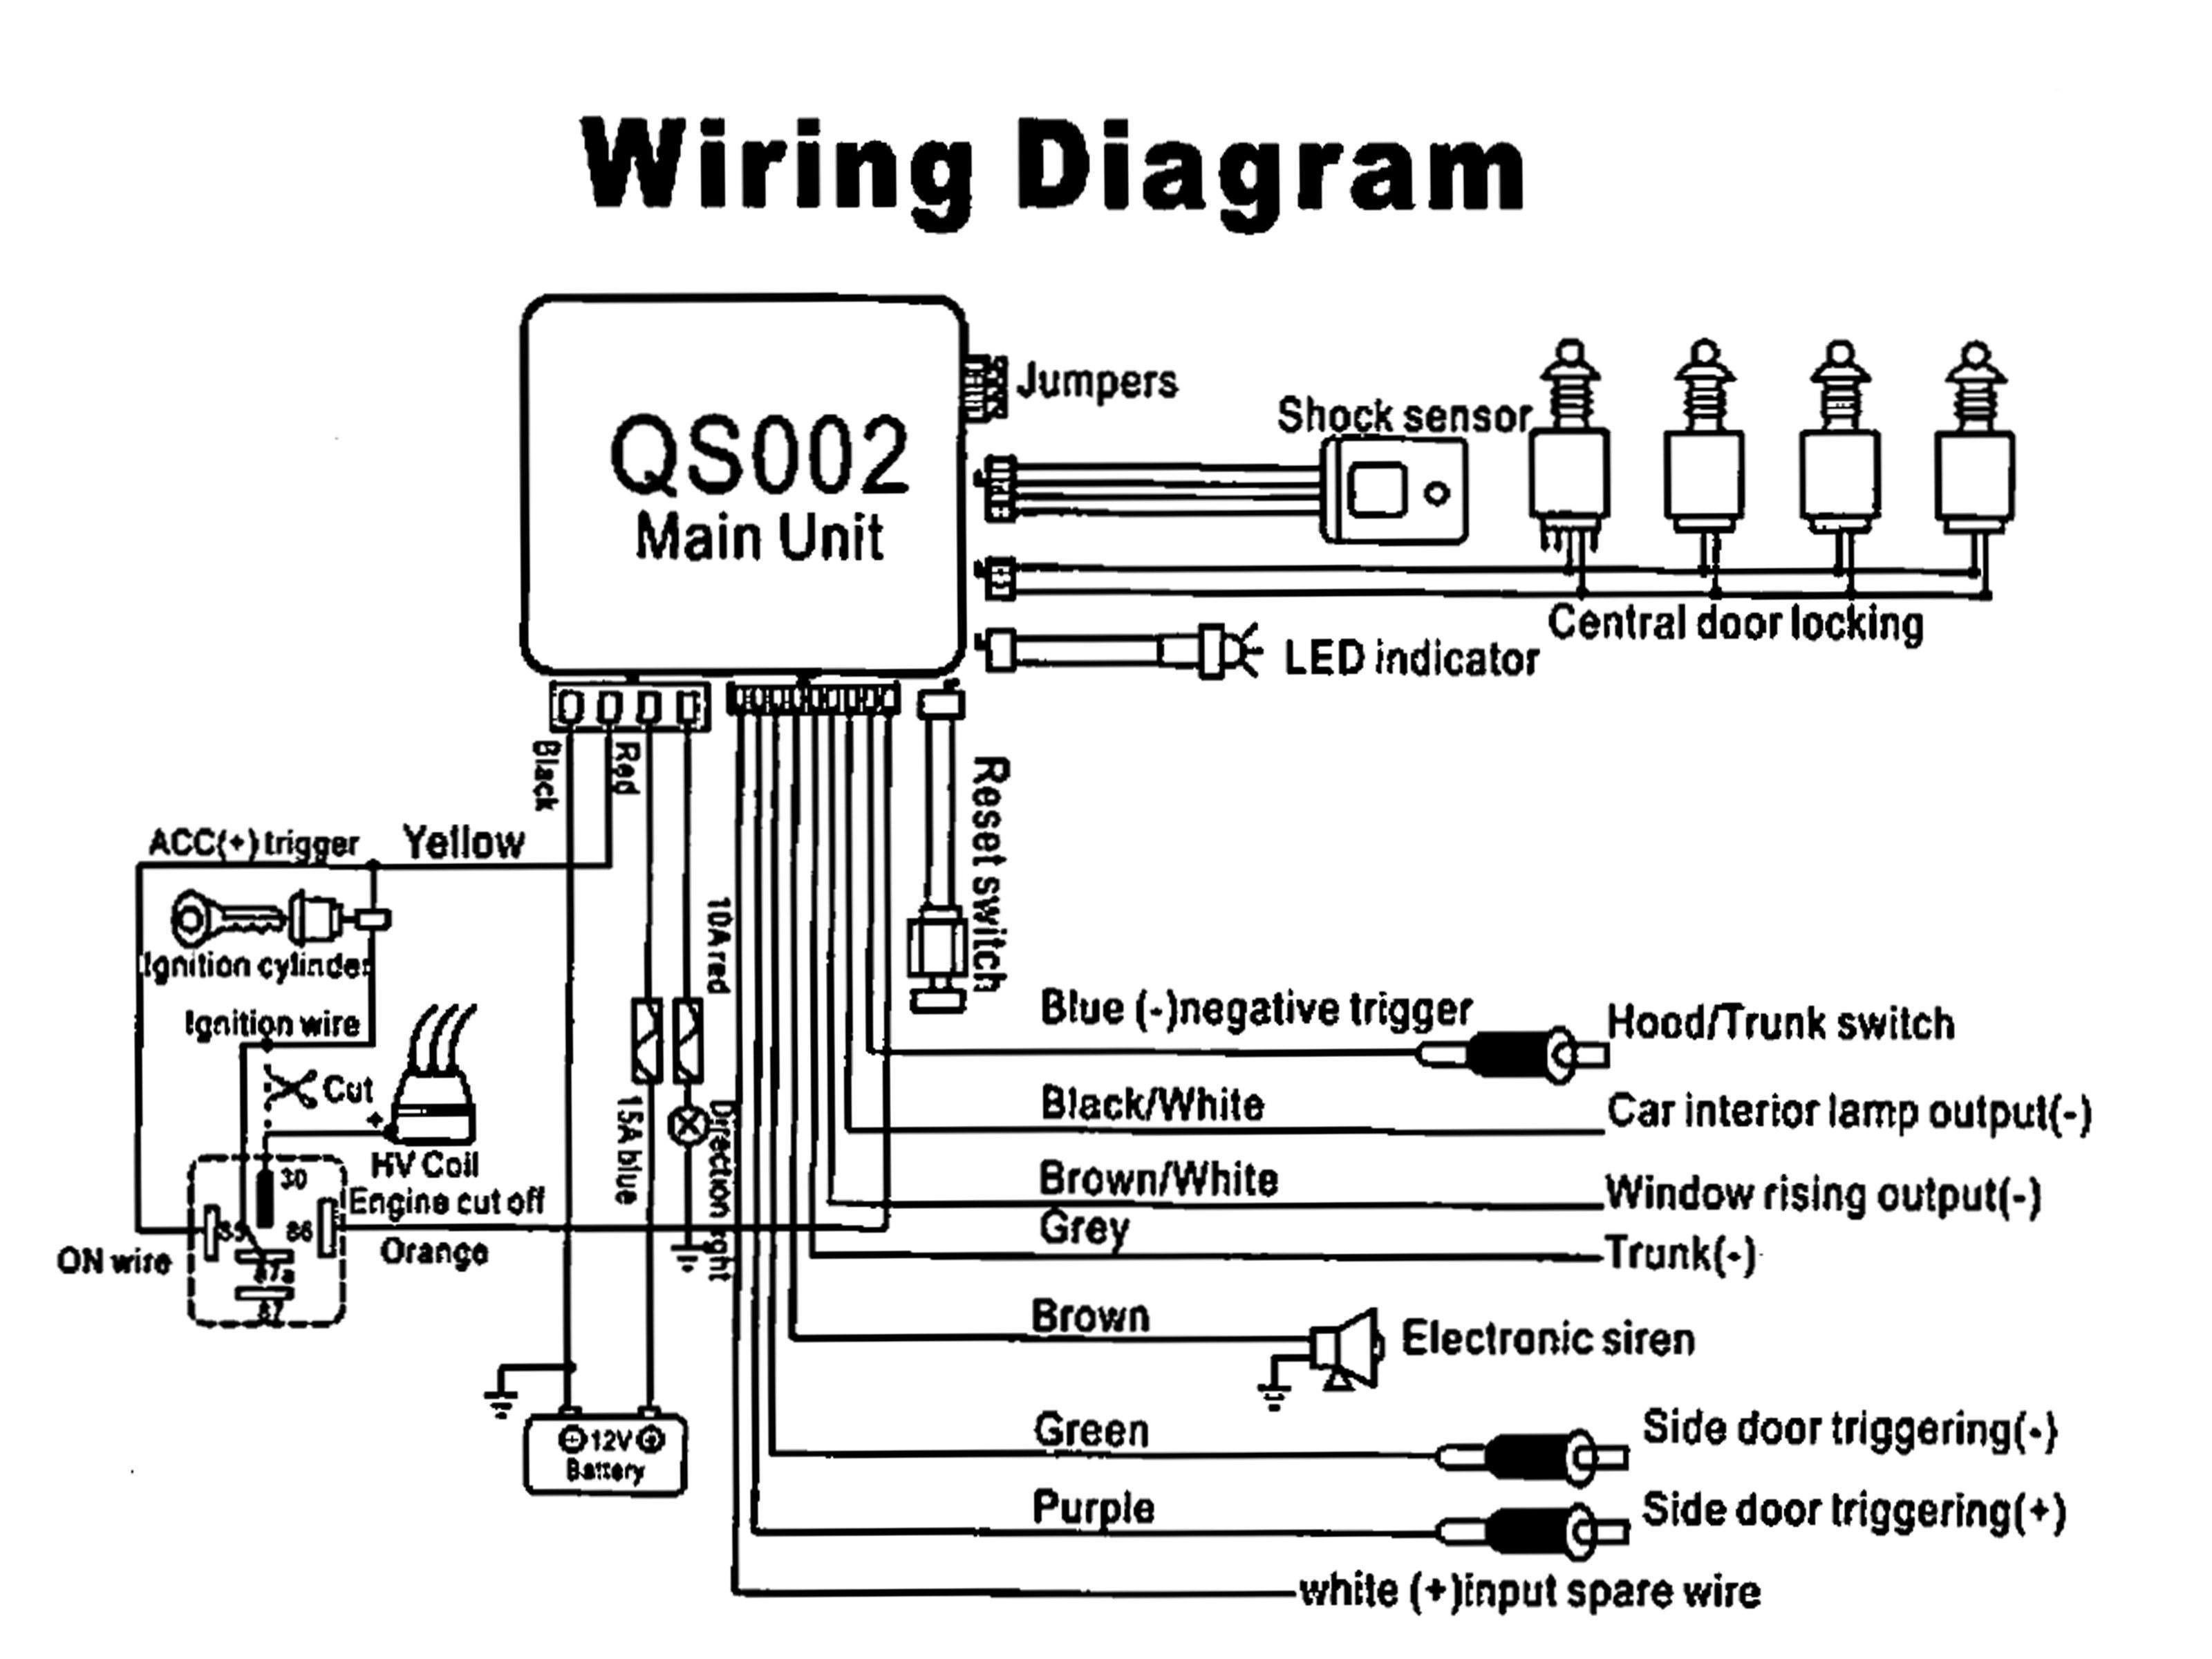 Unique Automotive Wiring Colours  Diagram  Wiringdiagram  Diagramming  Diagramm  Visuals